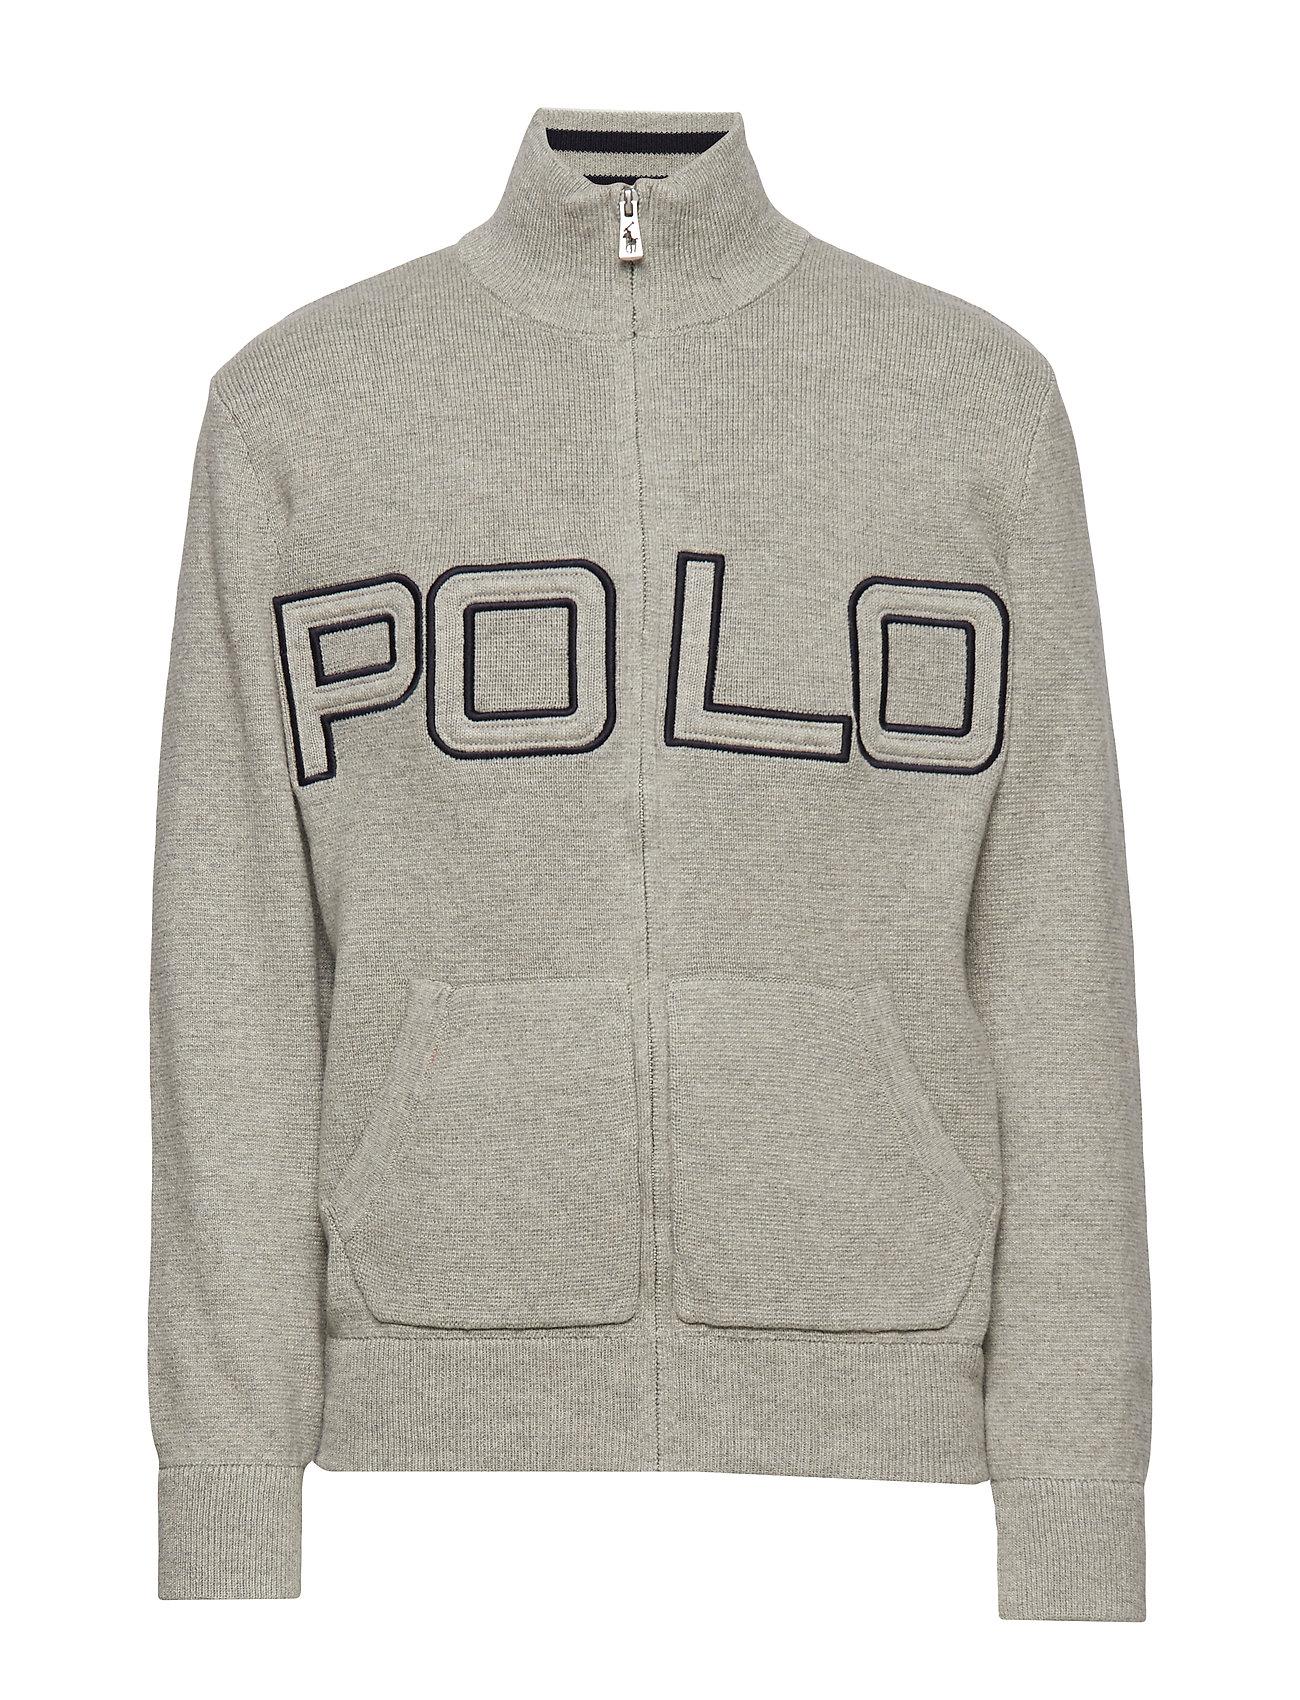 Ralph Lauren Kids Polo Cotton Full-Zip Sweater - DARK SPORT HEATHE